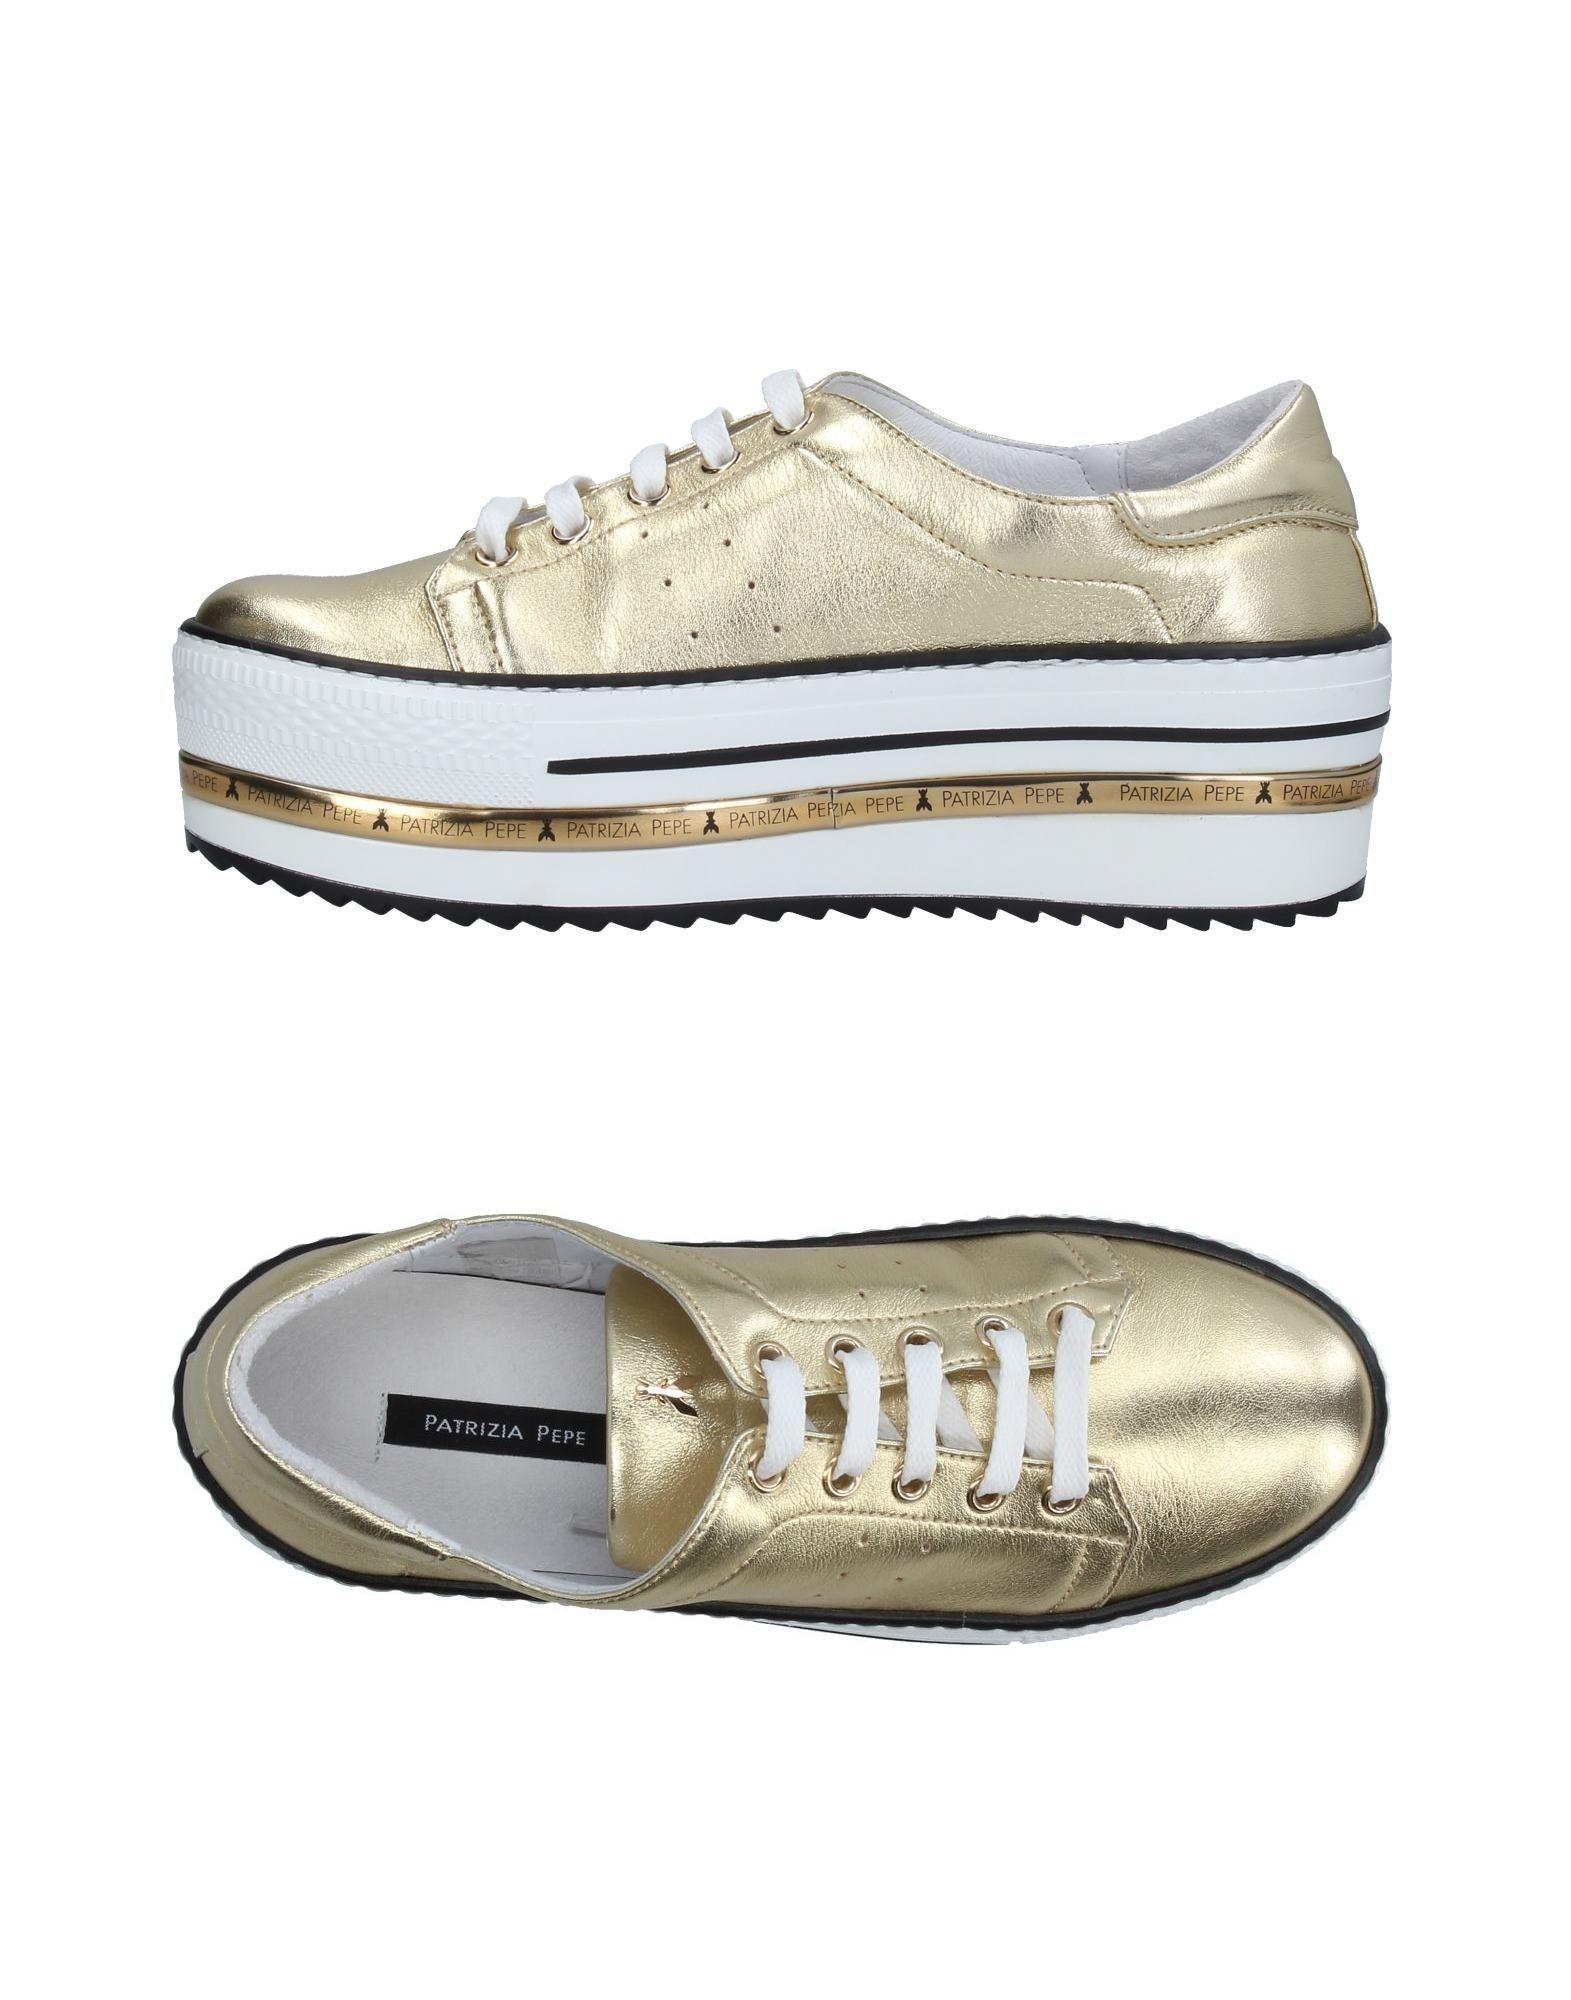 Lyst Low Tops In Patrizia Sneakers amp; Pepe Metallic ffwWPqST